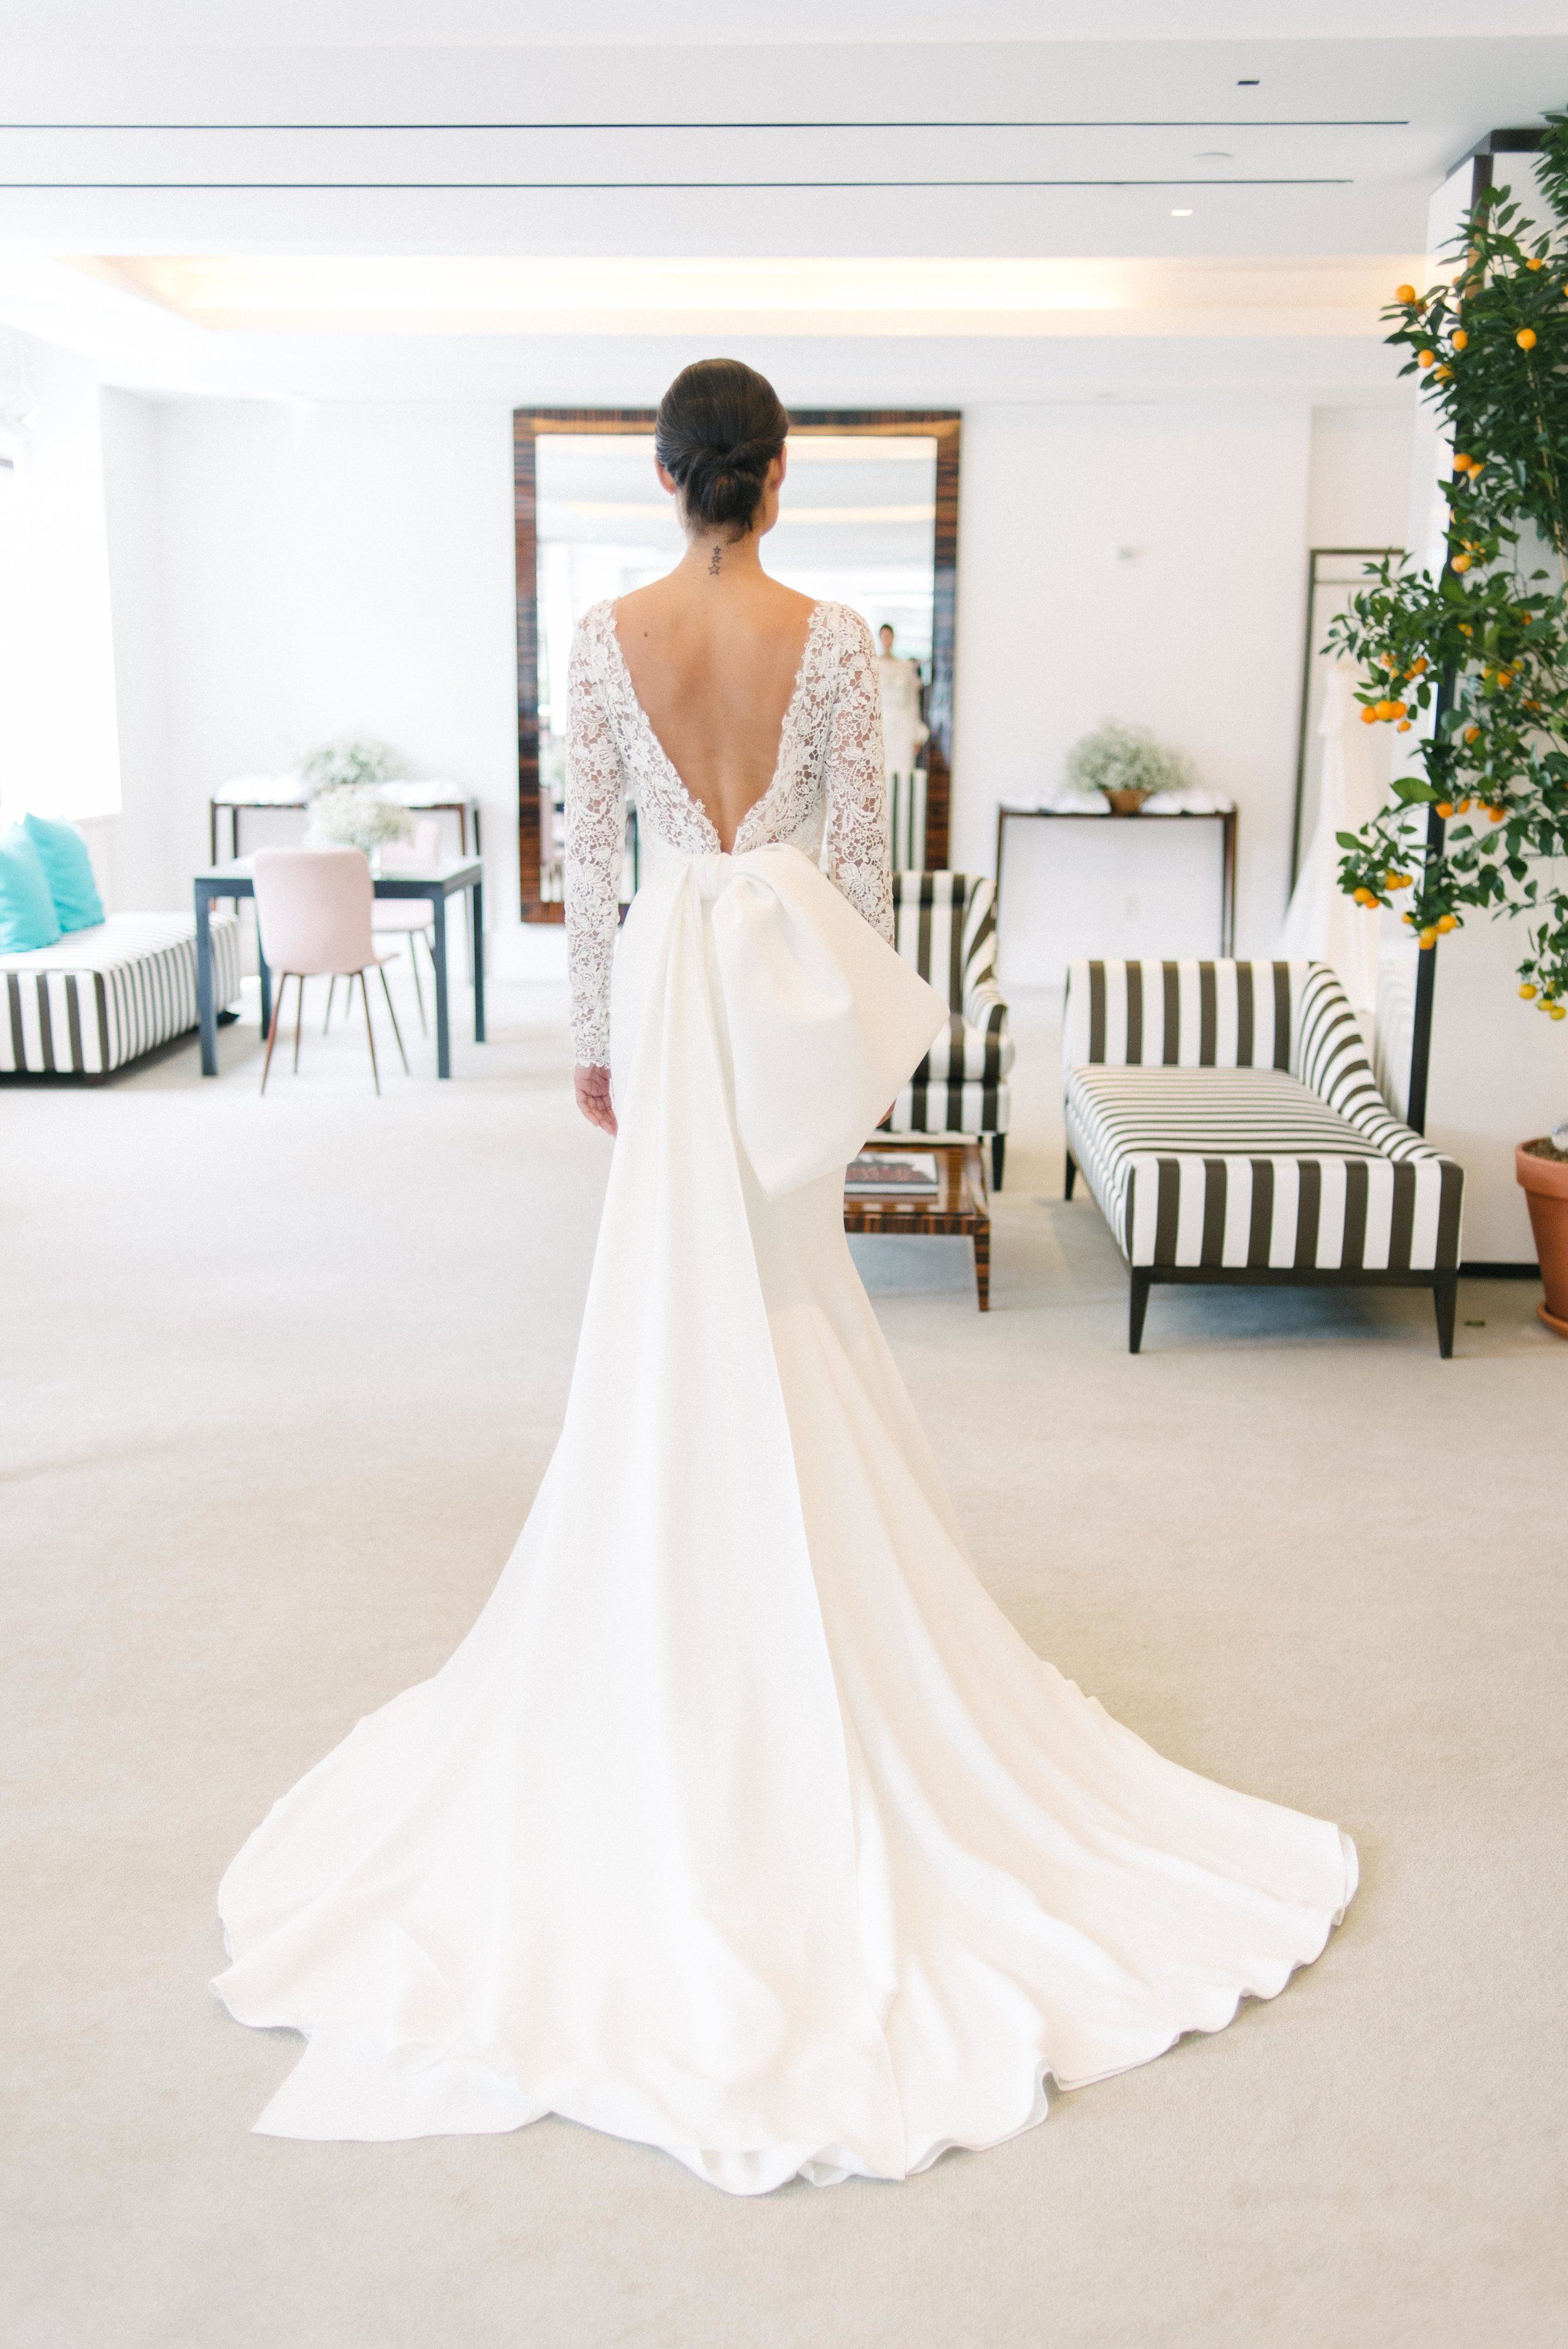 Carolina Herrera Spring 2020 Collection Preview Leyla Little White Dress Bridal White Bridal Dresses Carolina Herrera Bridal Carolina Herrera Wedding Dress